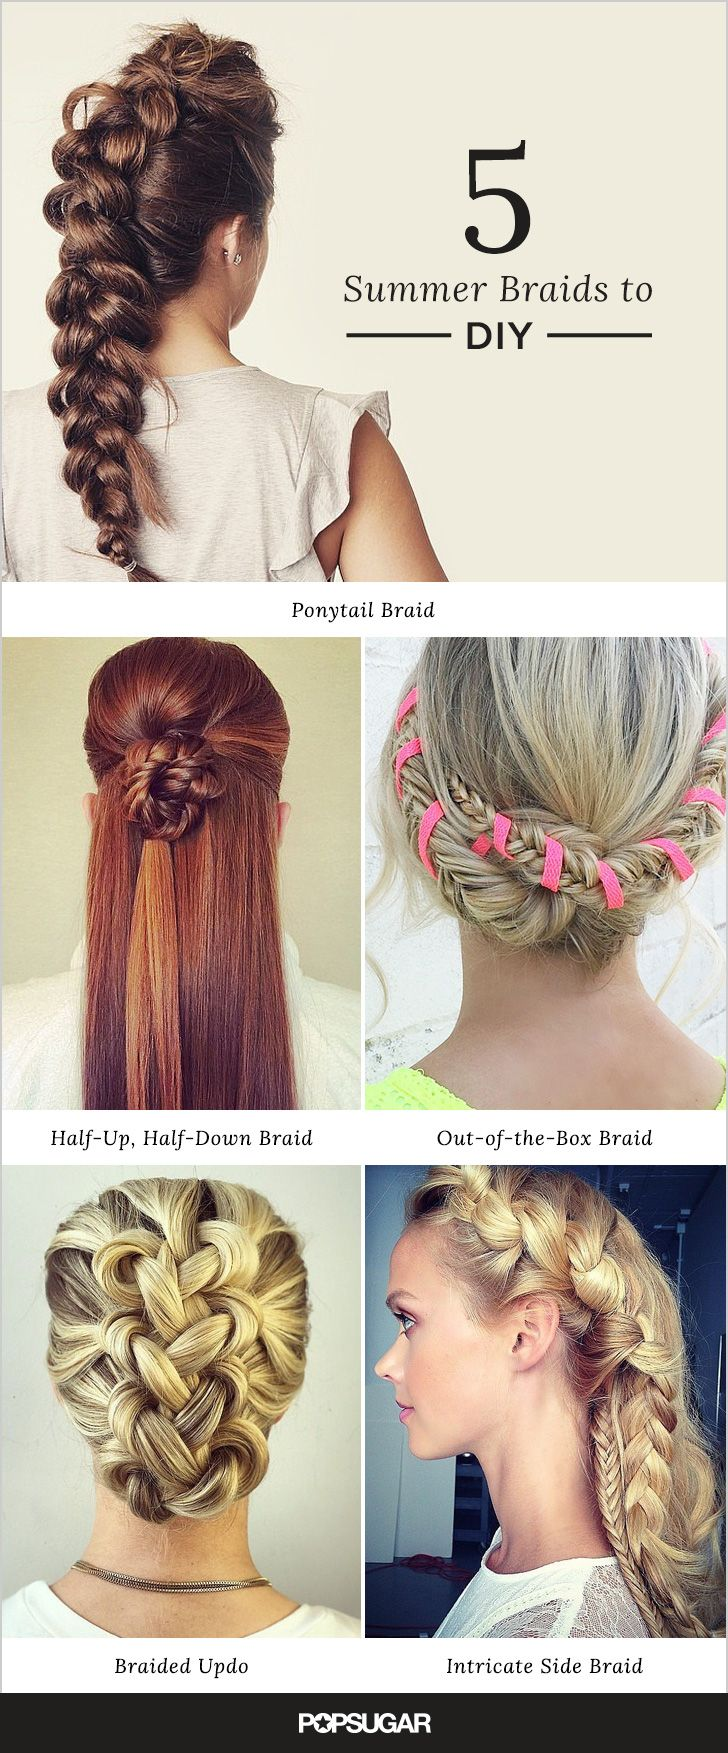 Hair guru sarah potempaus kicked off an epic new challenge on